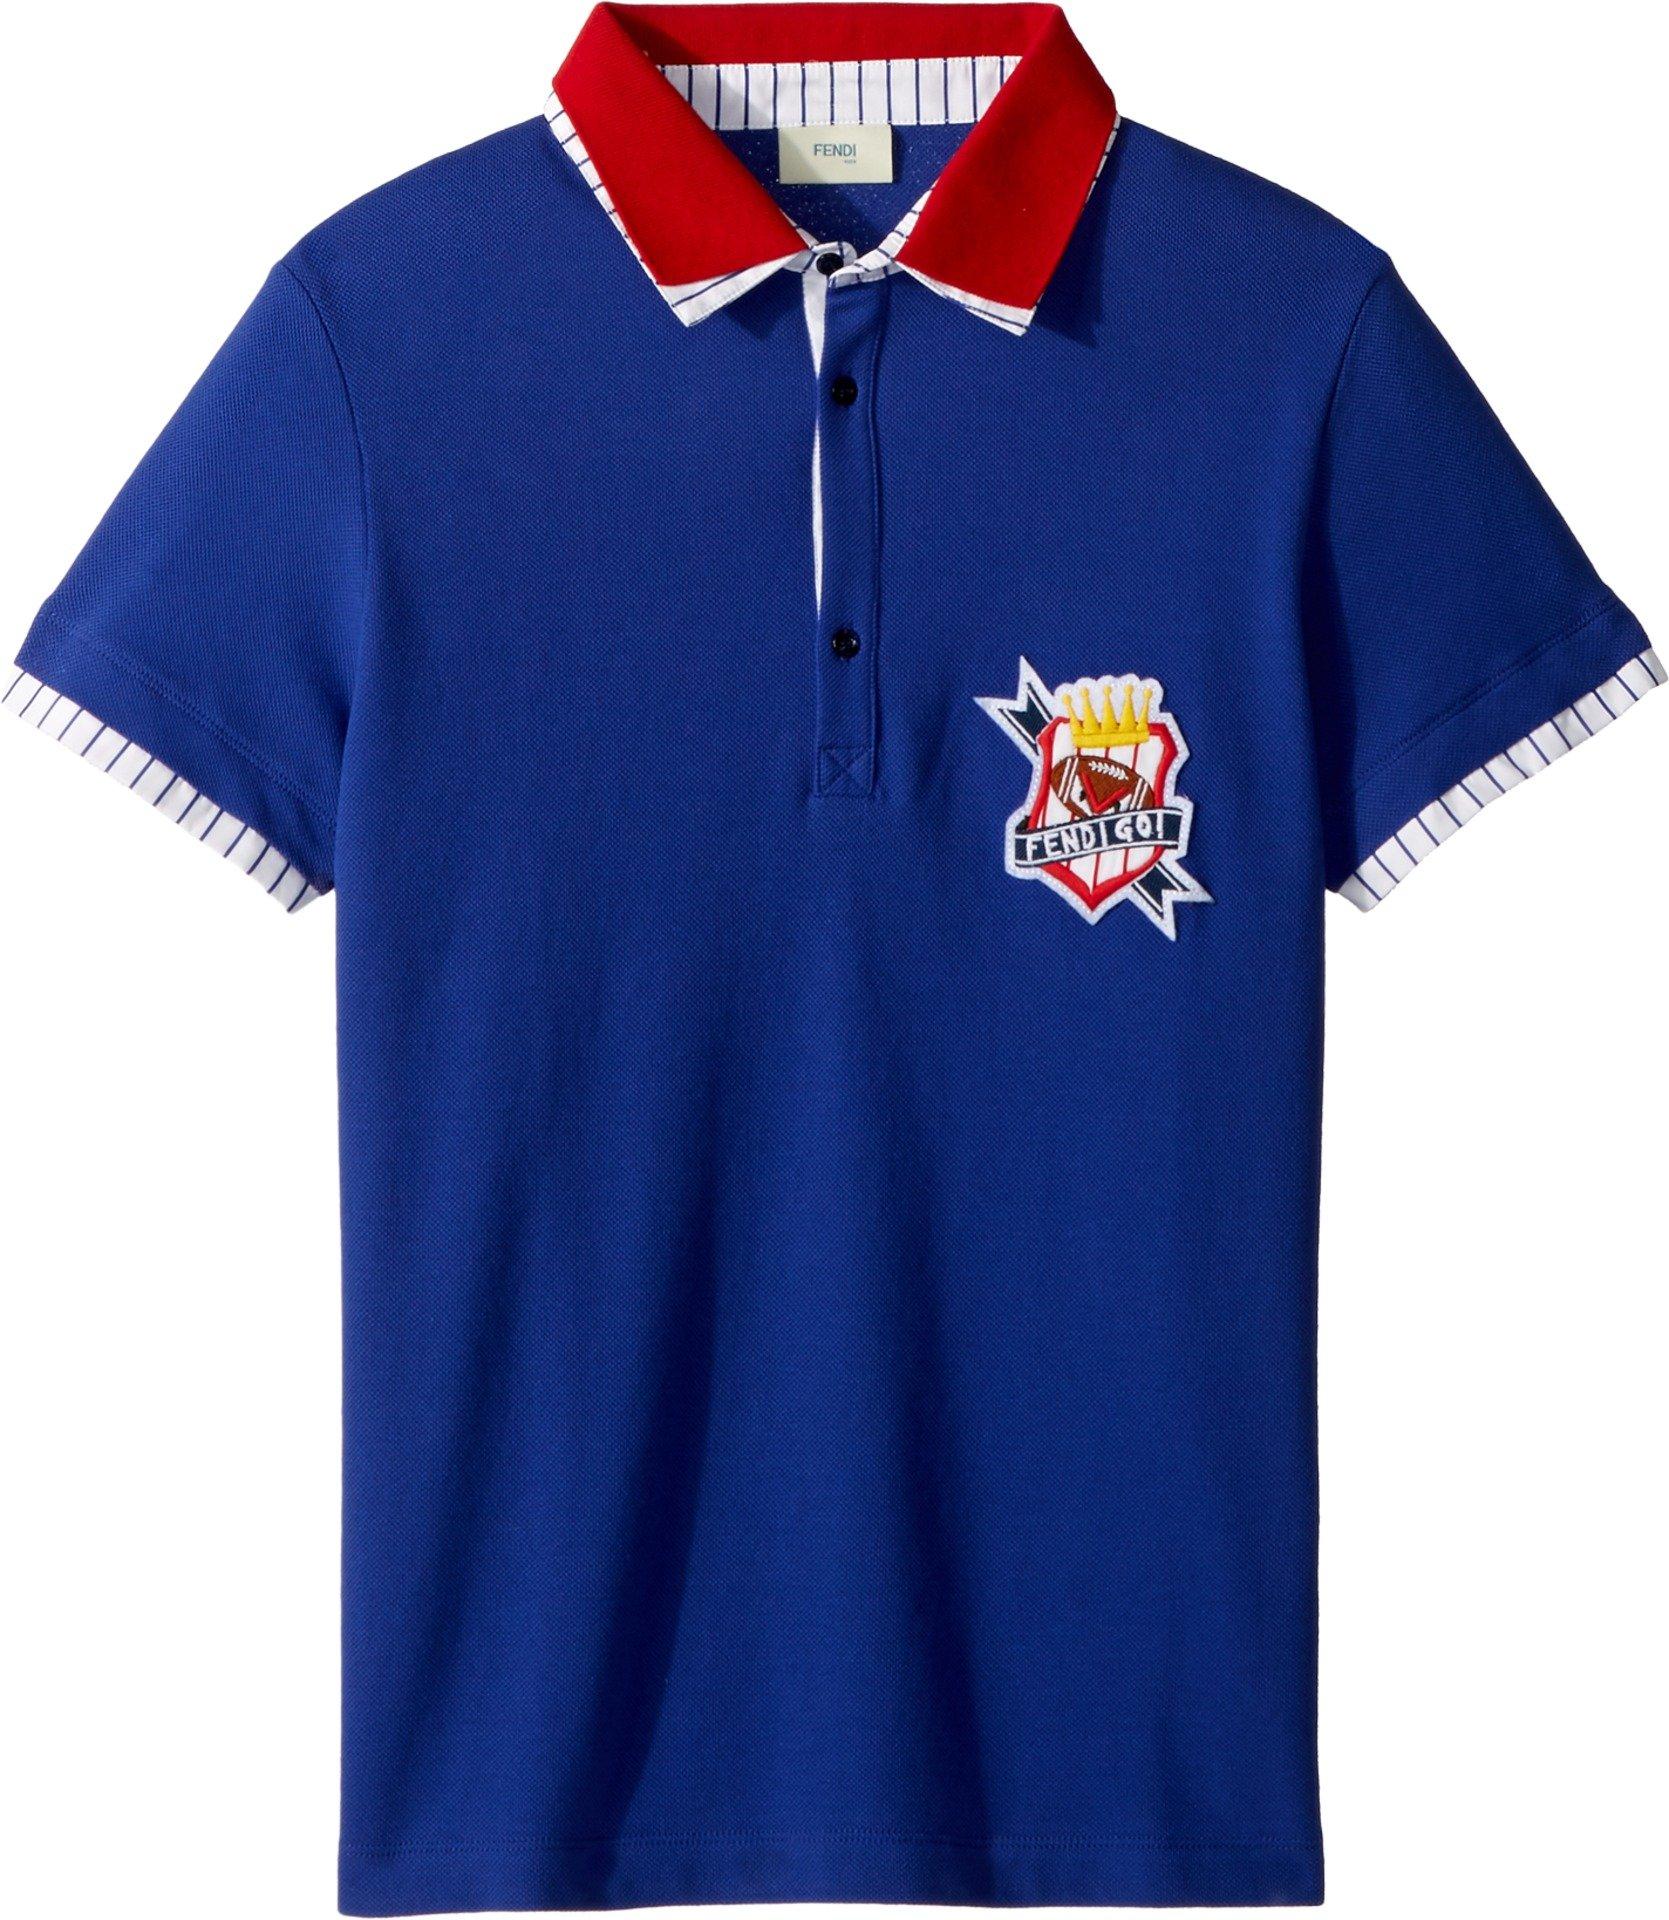 Fendi Kids Boy's Short Sleeve Polo T-Shirt w/Football Design on Front (Big Kids) Royal Blue 12 Years